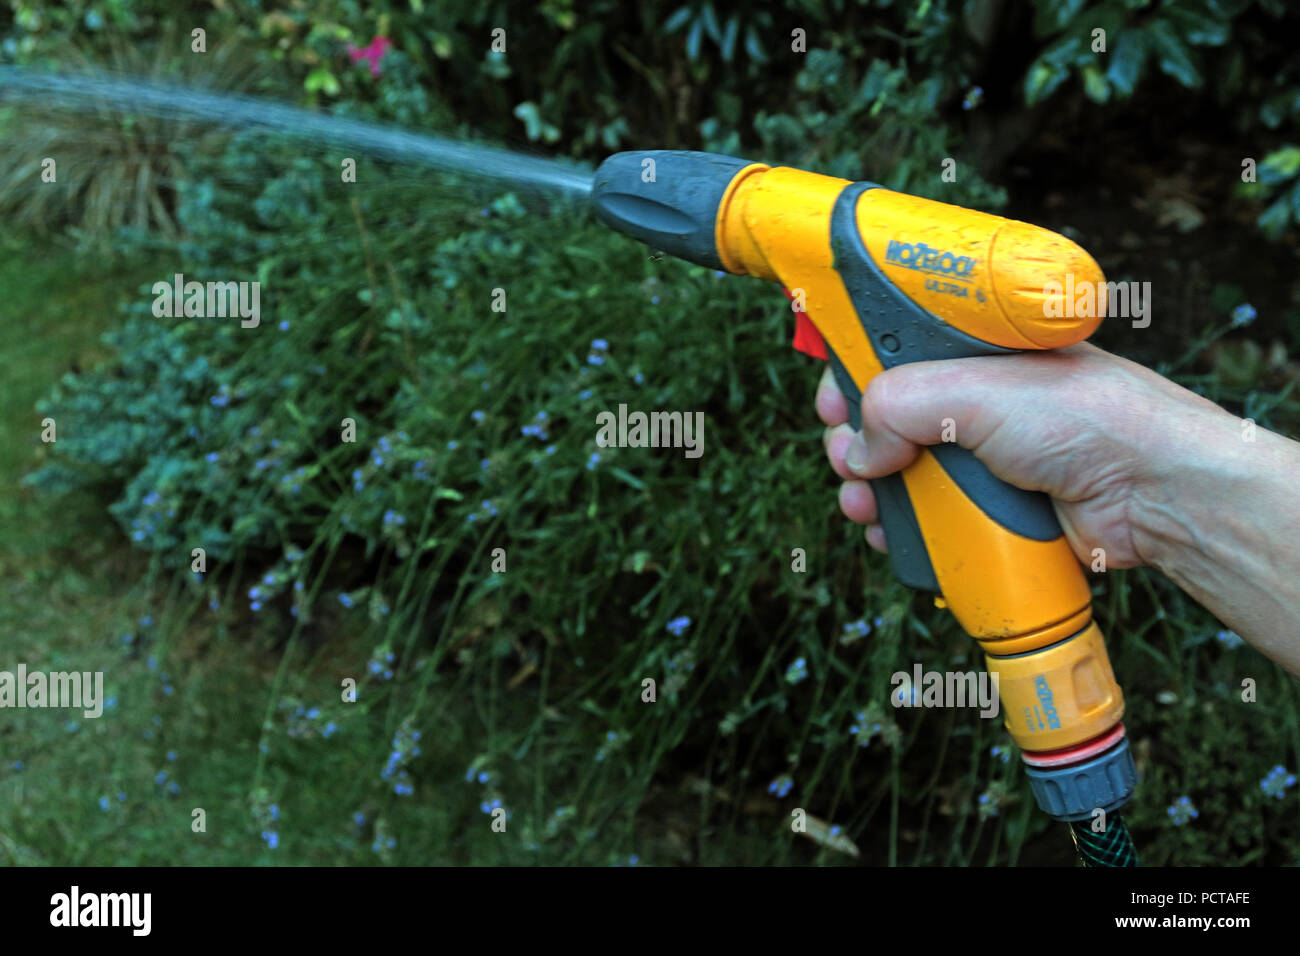 GoTonySmith,@HotpixUK,summer,warm,water,waste,hosepipe,pointing,spray,spraying,hosepipe